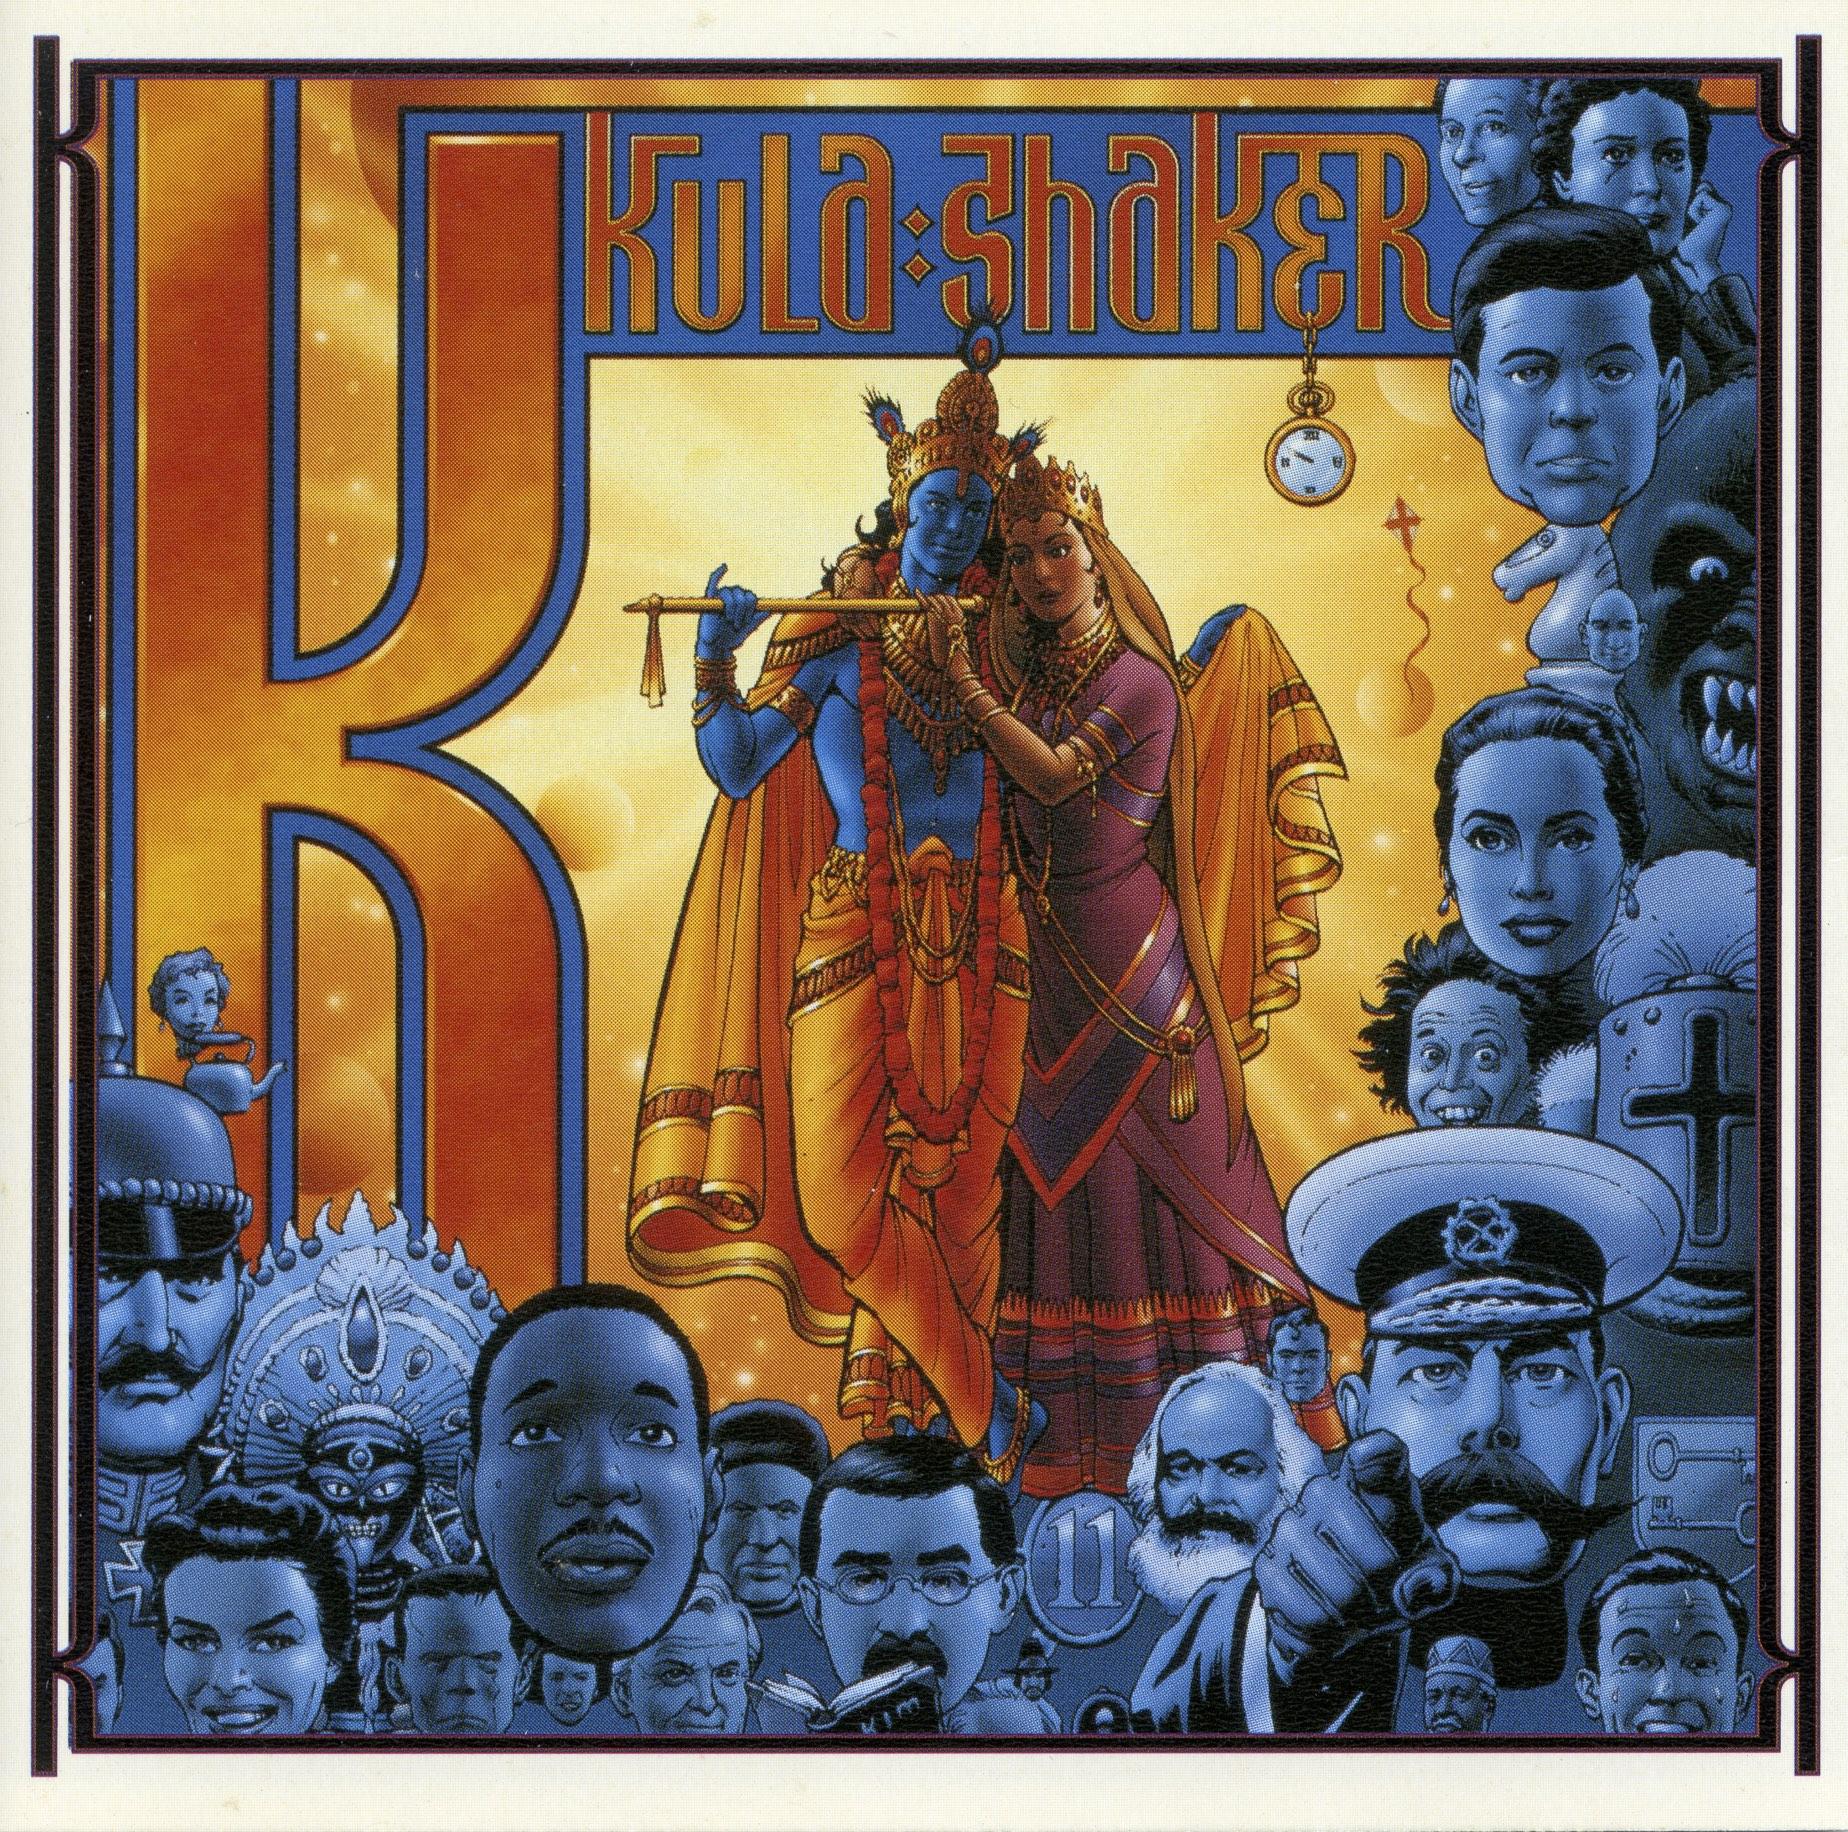 1996 - Kula Shaker